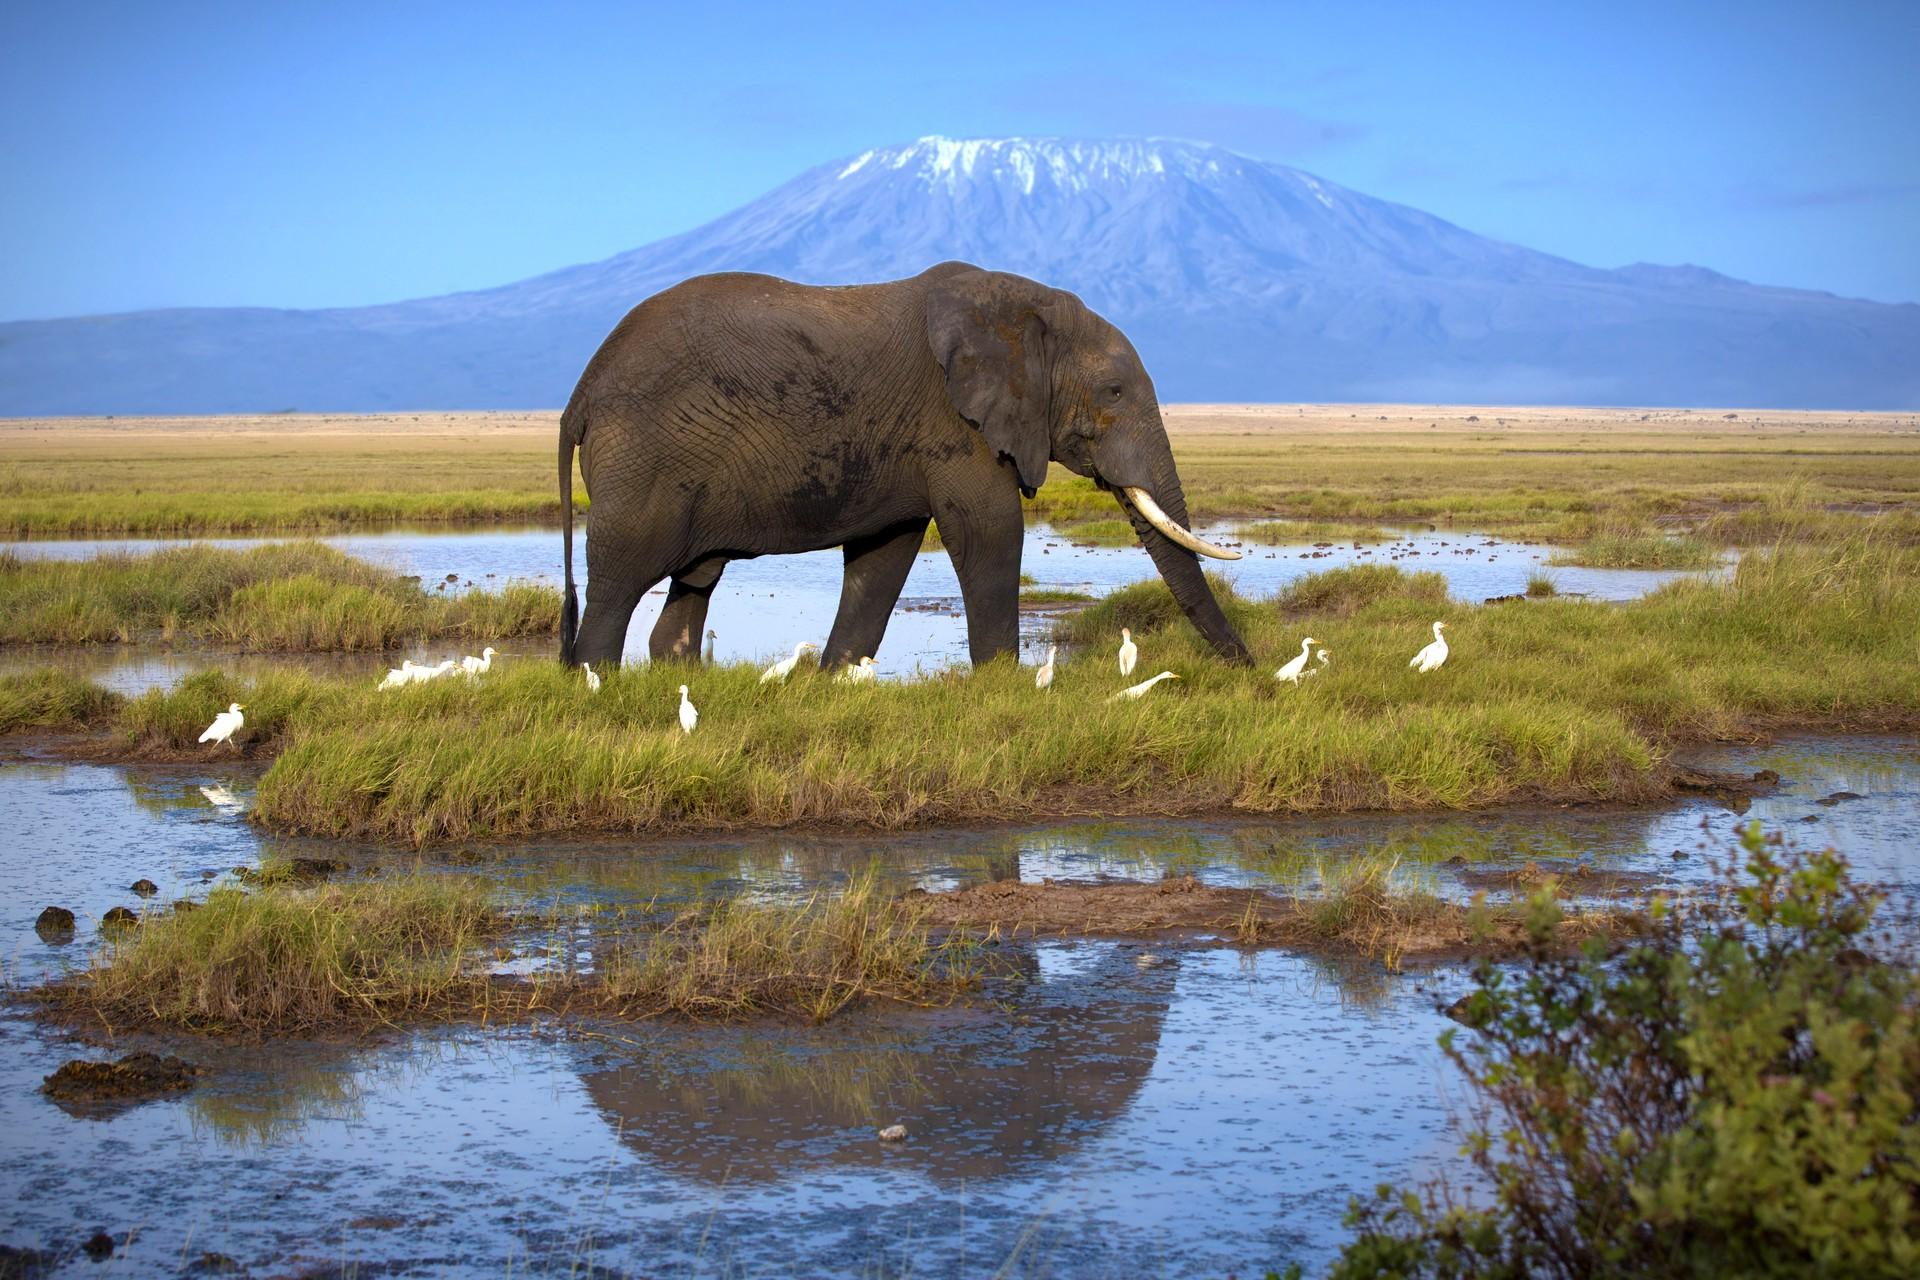 Kilimanjaro behind bull elephant, Tanzania